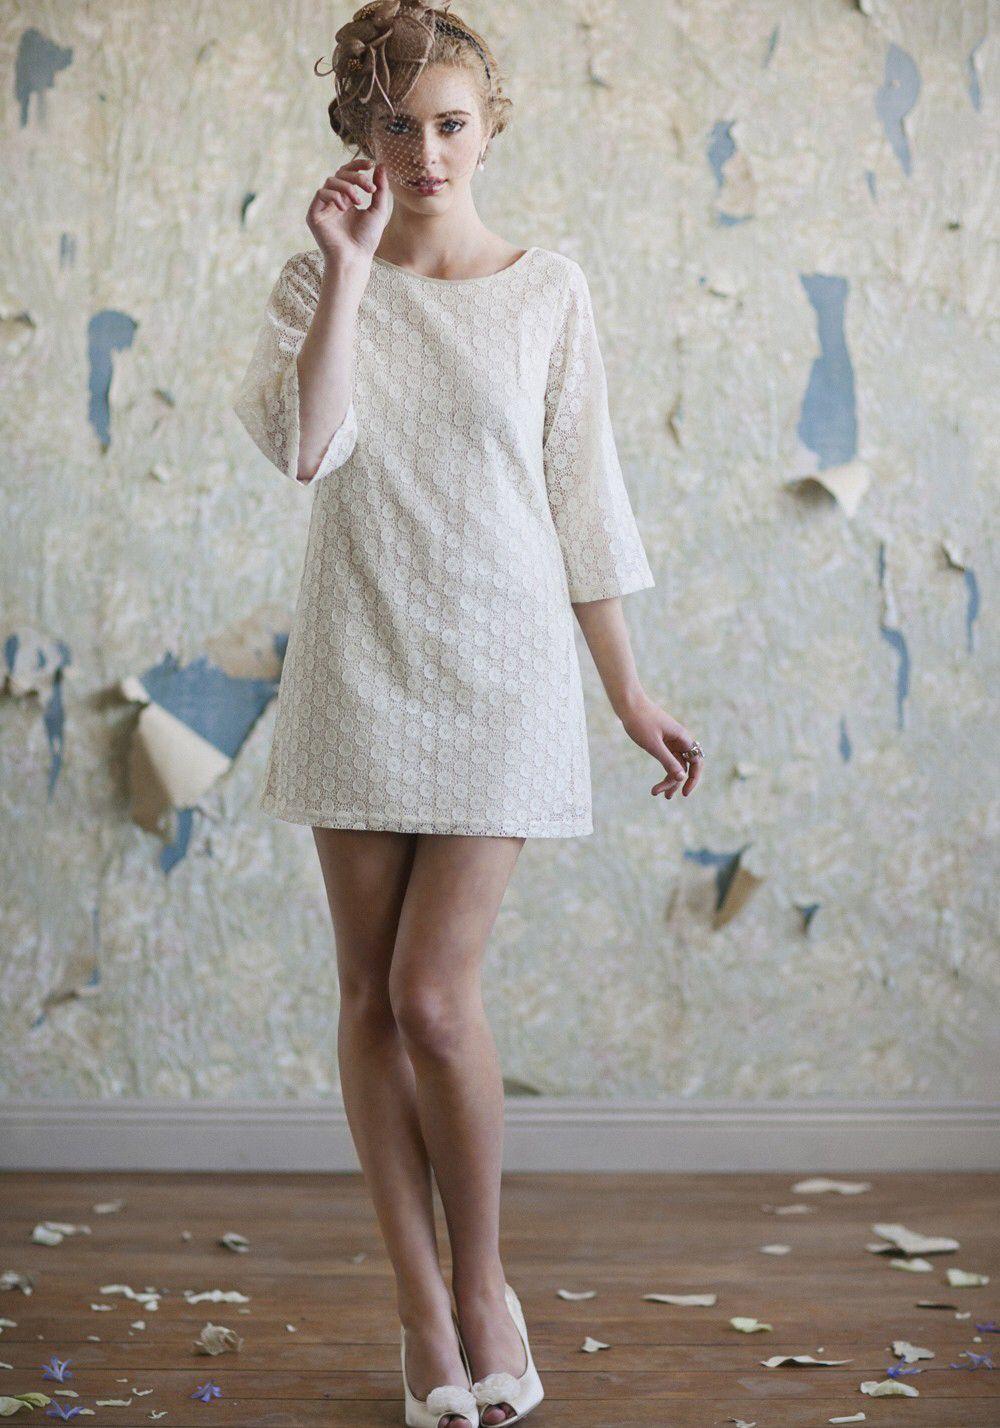 2019 Scarlett Moffatt nudes (54 photos), Pussy, Paparazzi, Twitter, underwear 2017